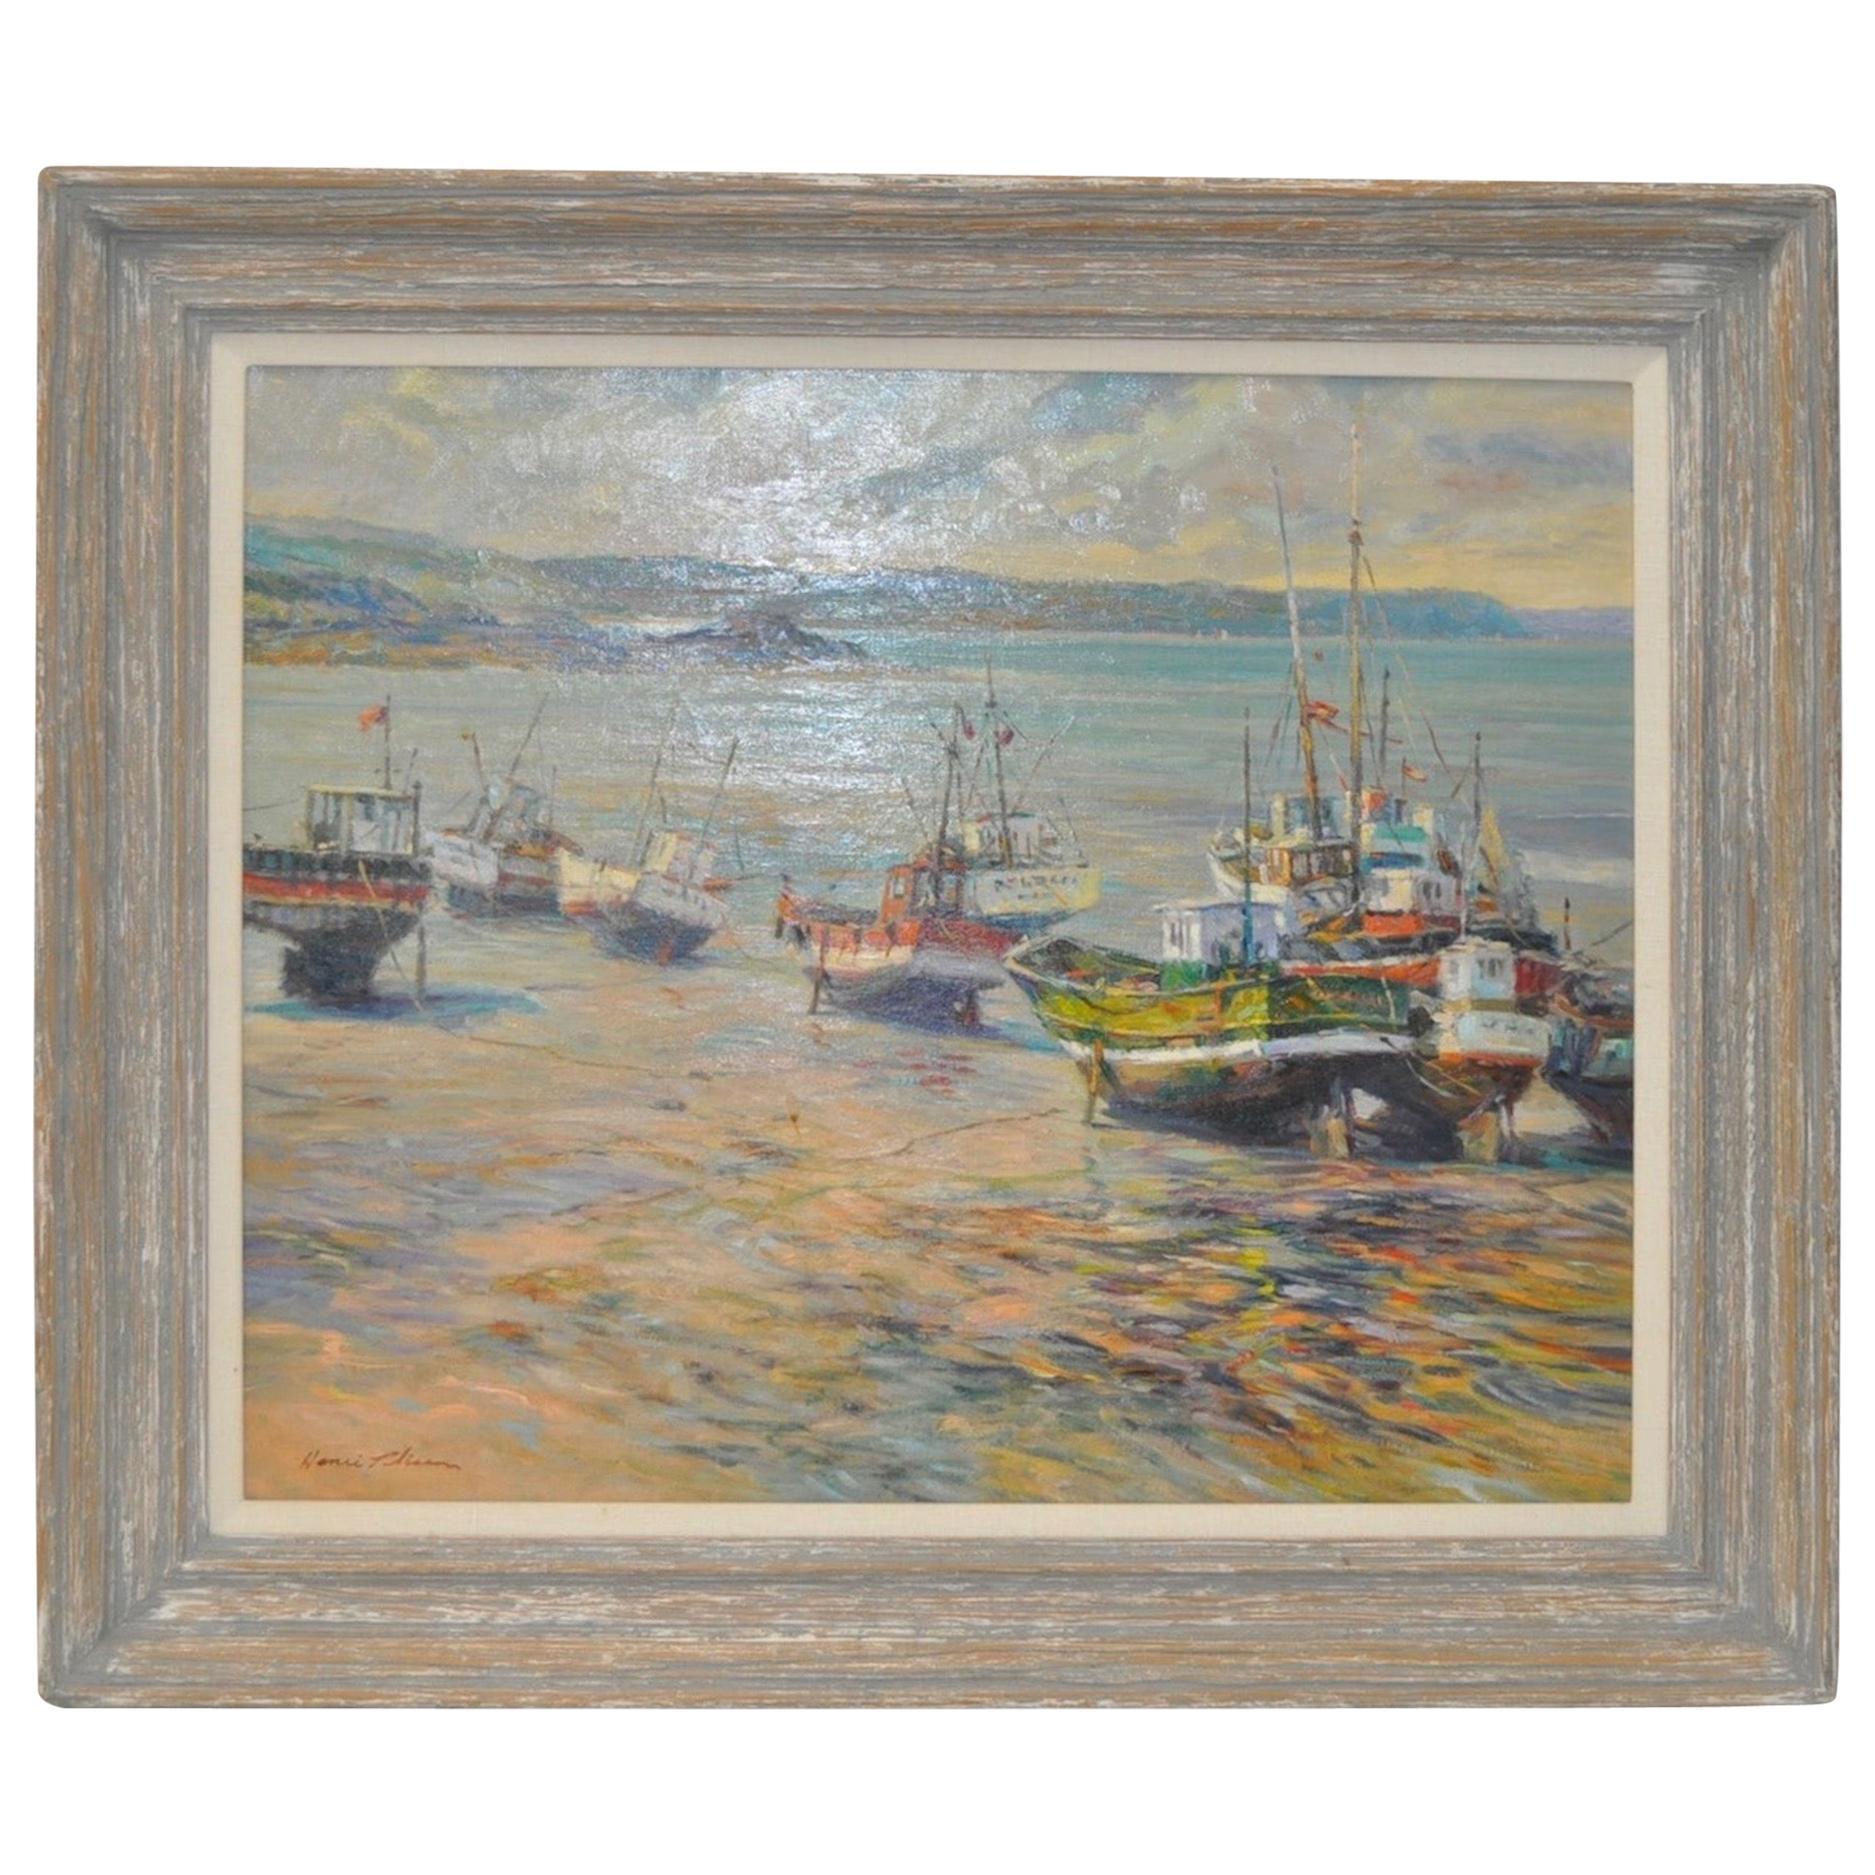 "Henri Plisson 'French' ""Coastal Scene"" Original Oil on Canvas, circa 1970"